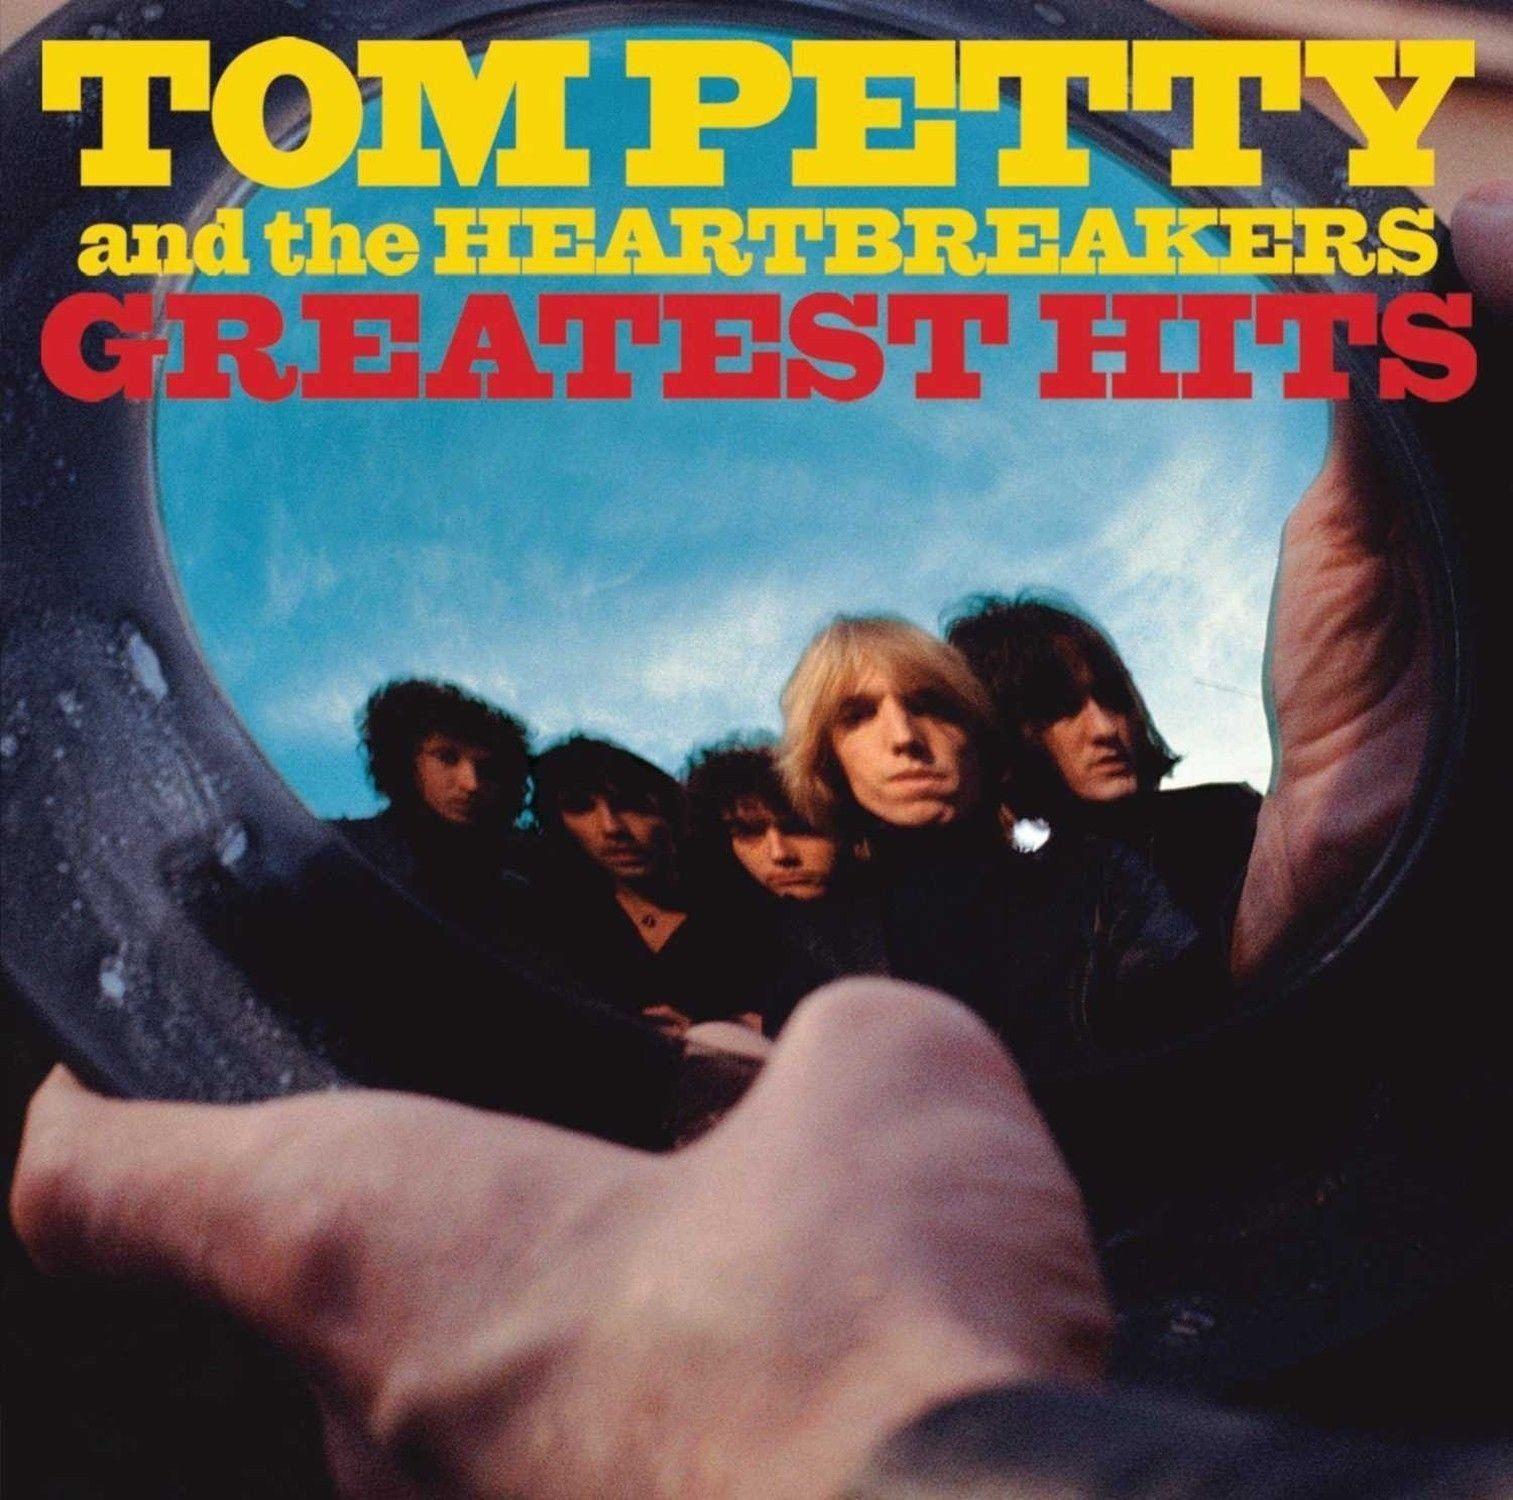 Tom Petty Amp The Heartbreakers Greatest Hits Wishlist